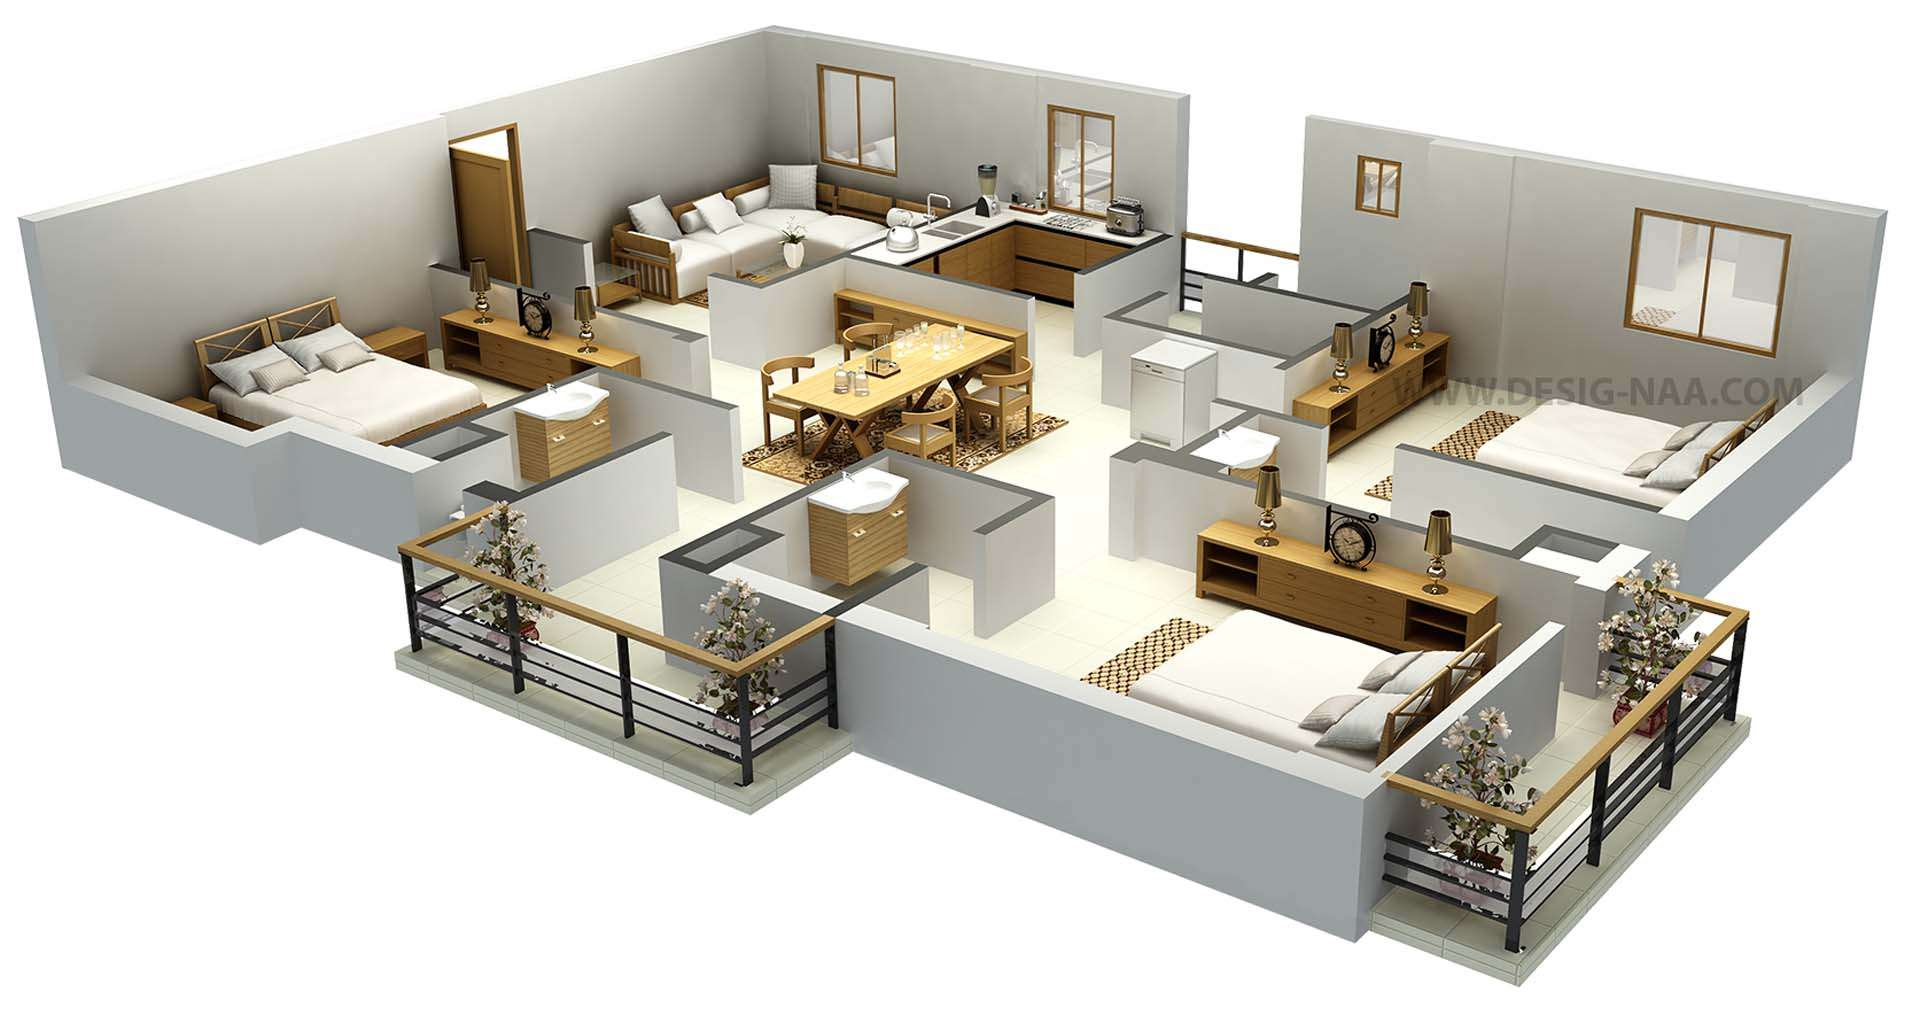 Bedroom Flat Plan Ideas House Design Plans